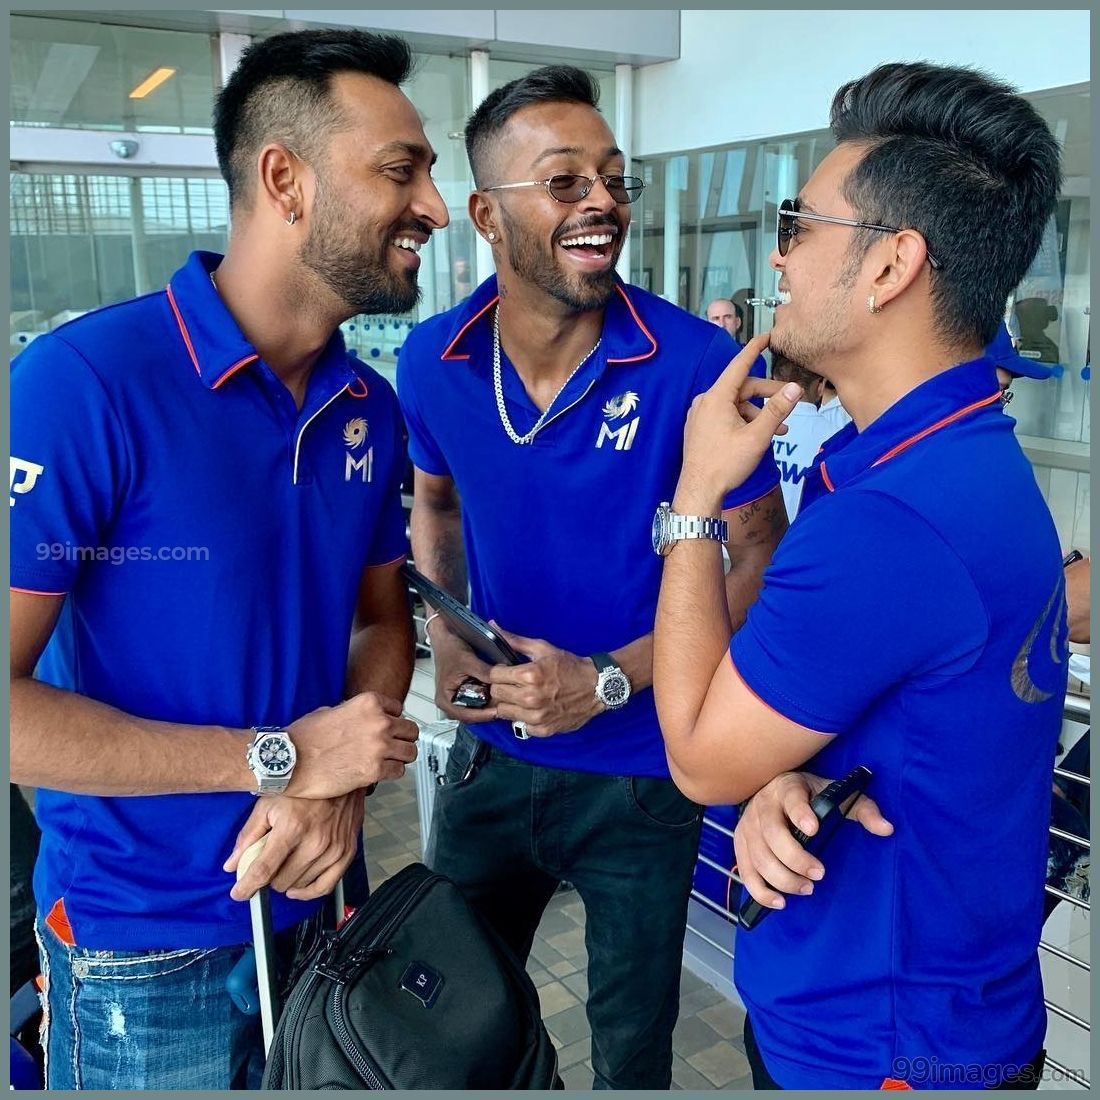 Hardik Pandya Photoshoot Images Hd Wallpapers 1080p 16380 Hardikpandya Cricketer Hdimages Hardikpan Bold Haircuts Mumbai Indians Hairstyles Haircuts